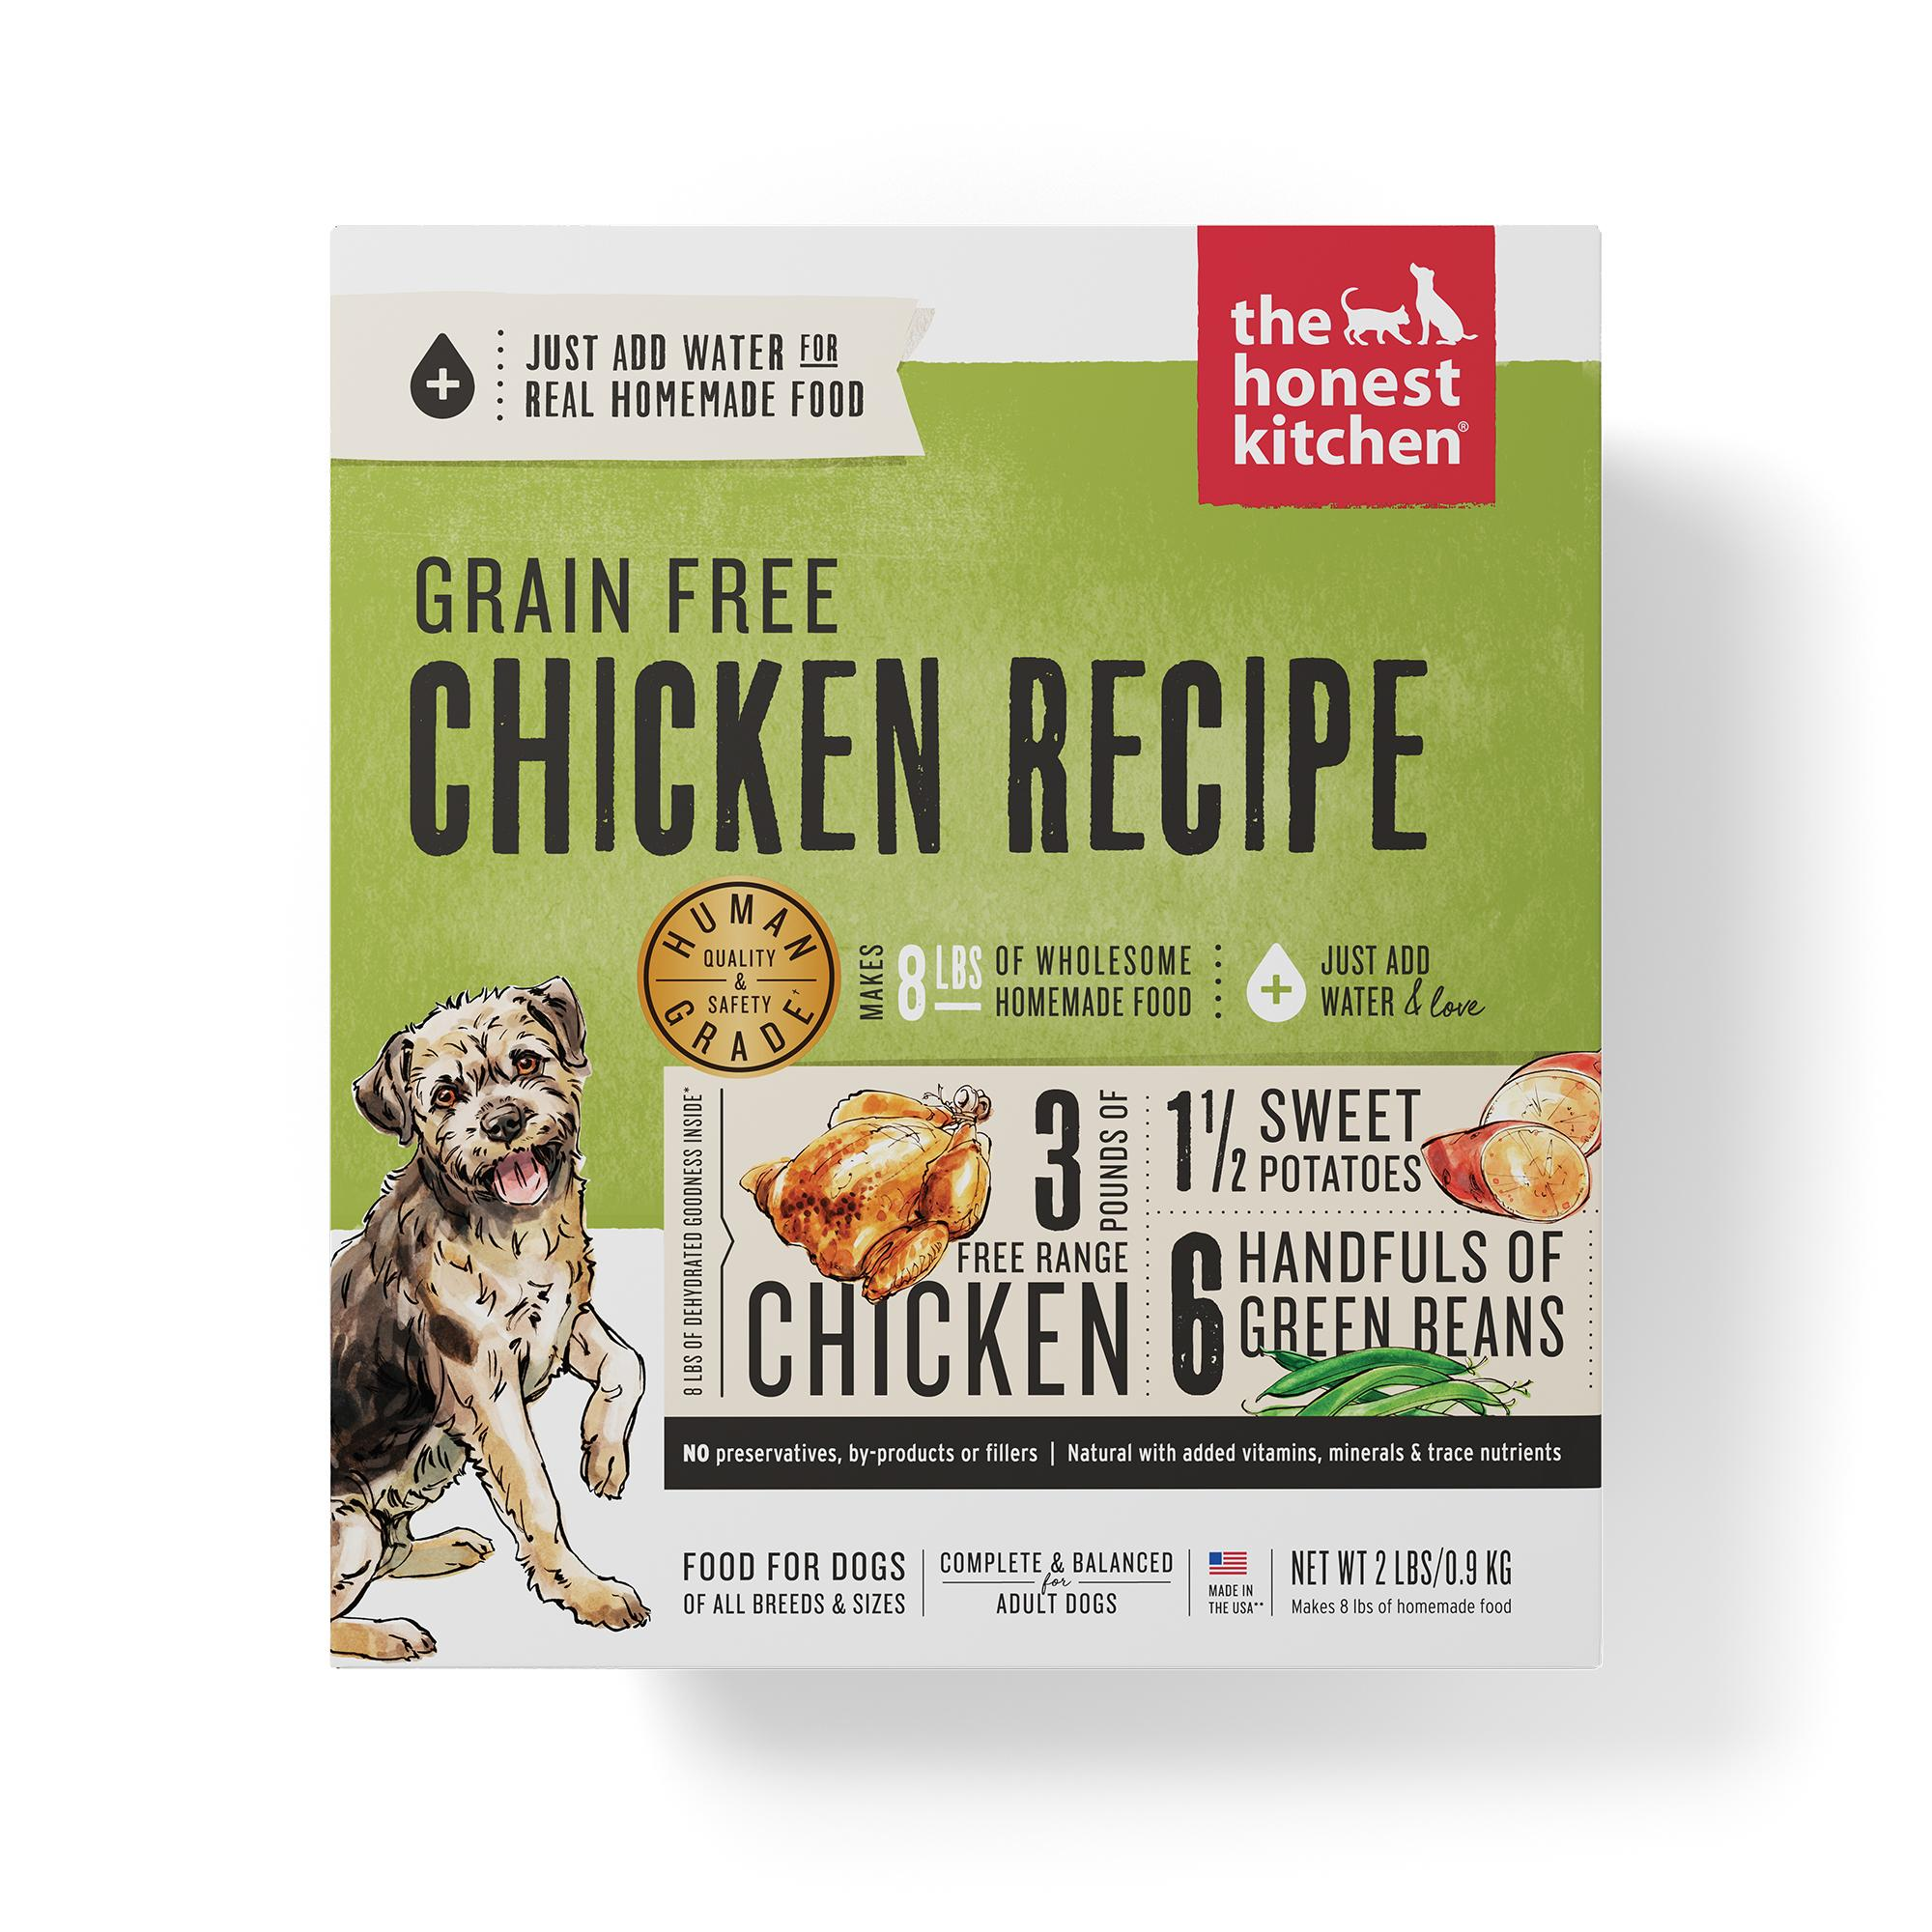 The Honest Kitchen Chicken Recipe Grain-Free Dehydrated Dog Food, 2-lb box